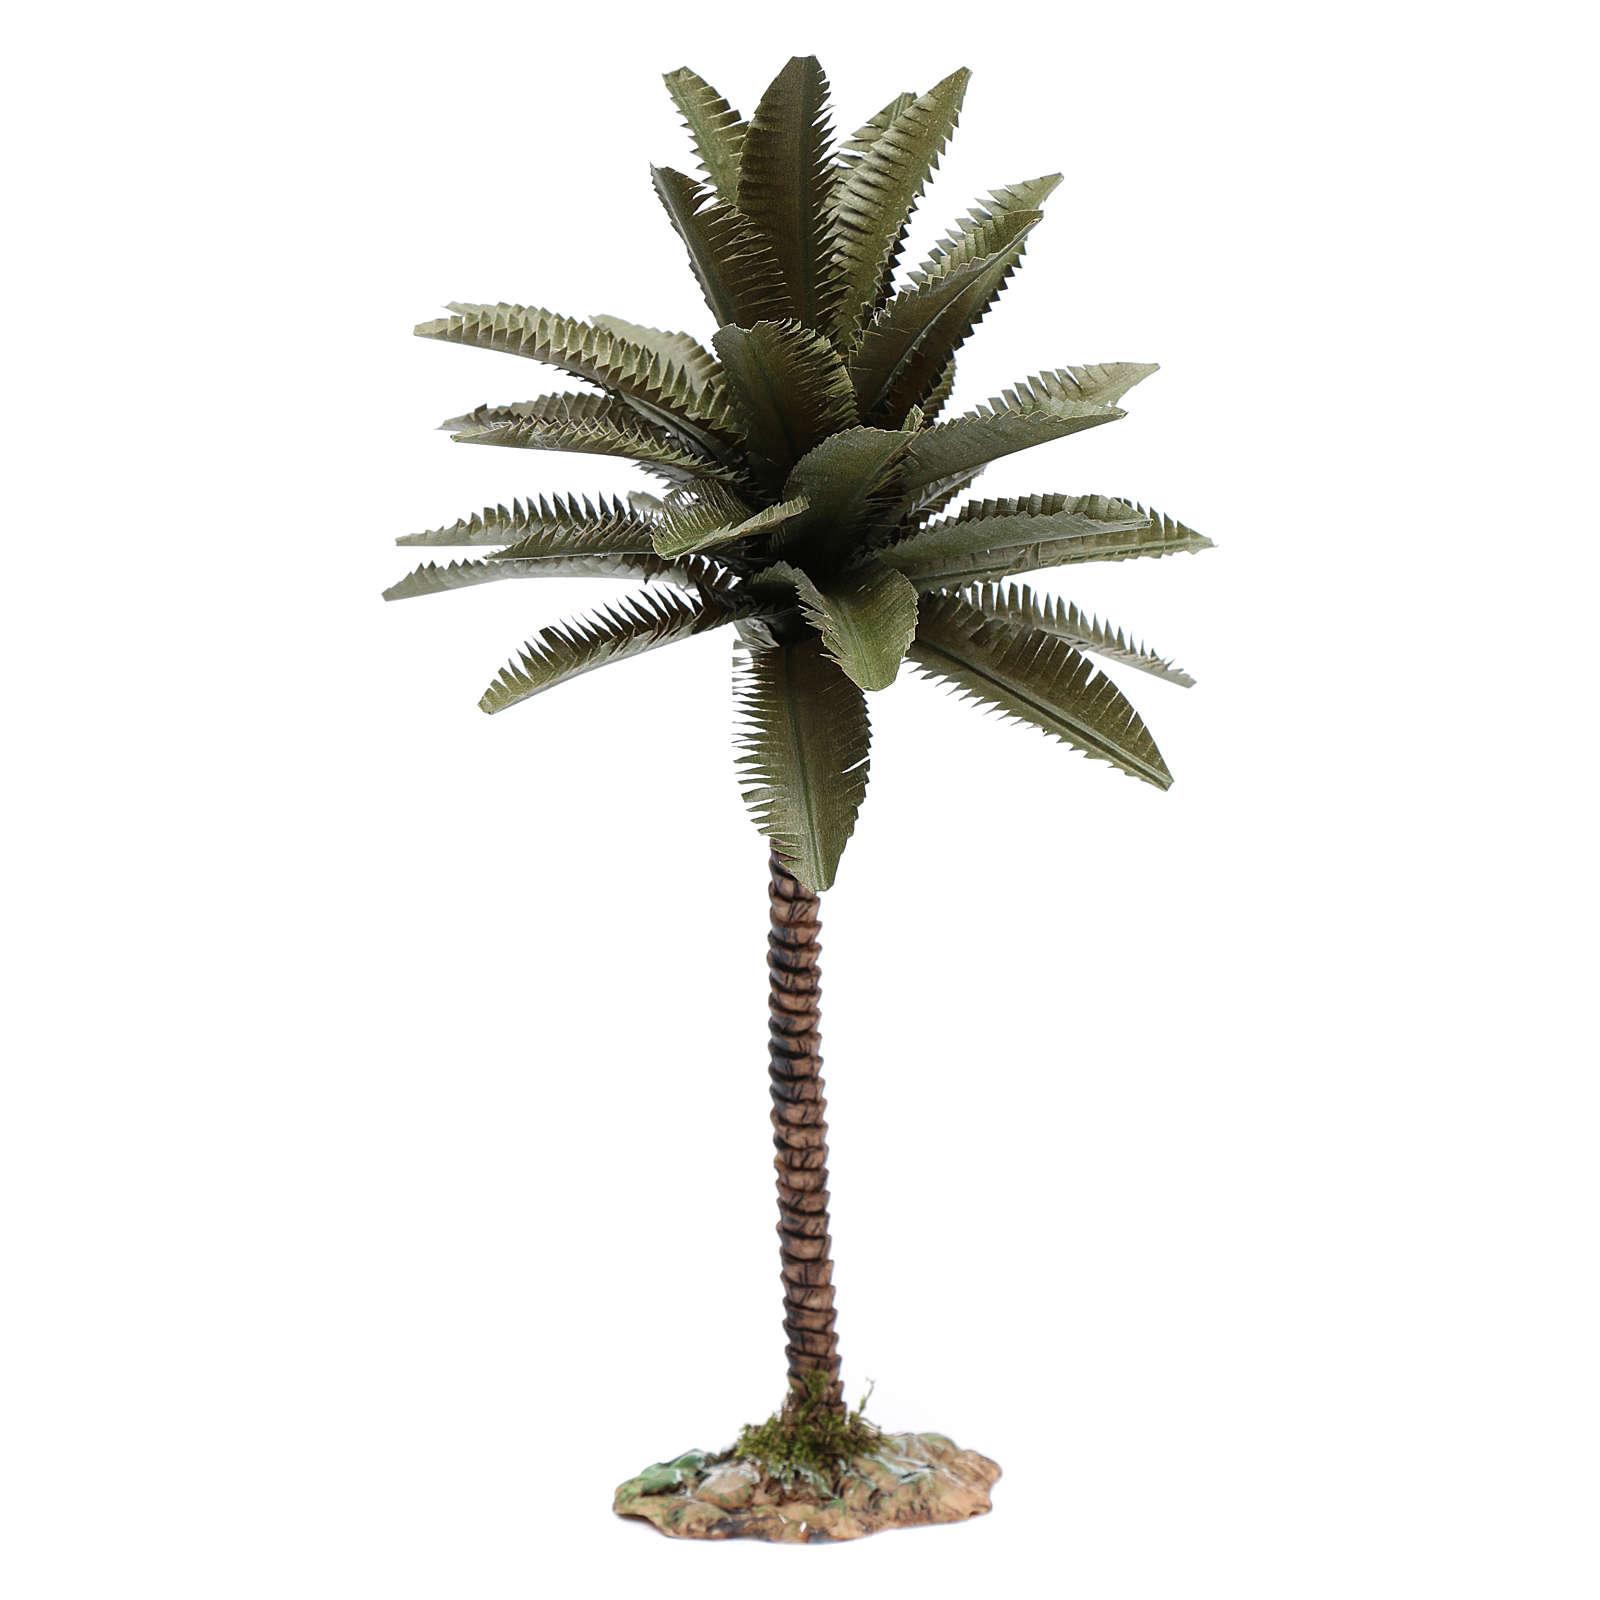 Resin palm tree 25 cm tall 4